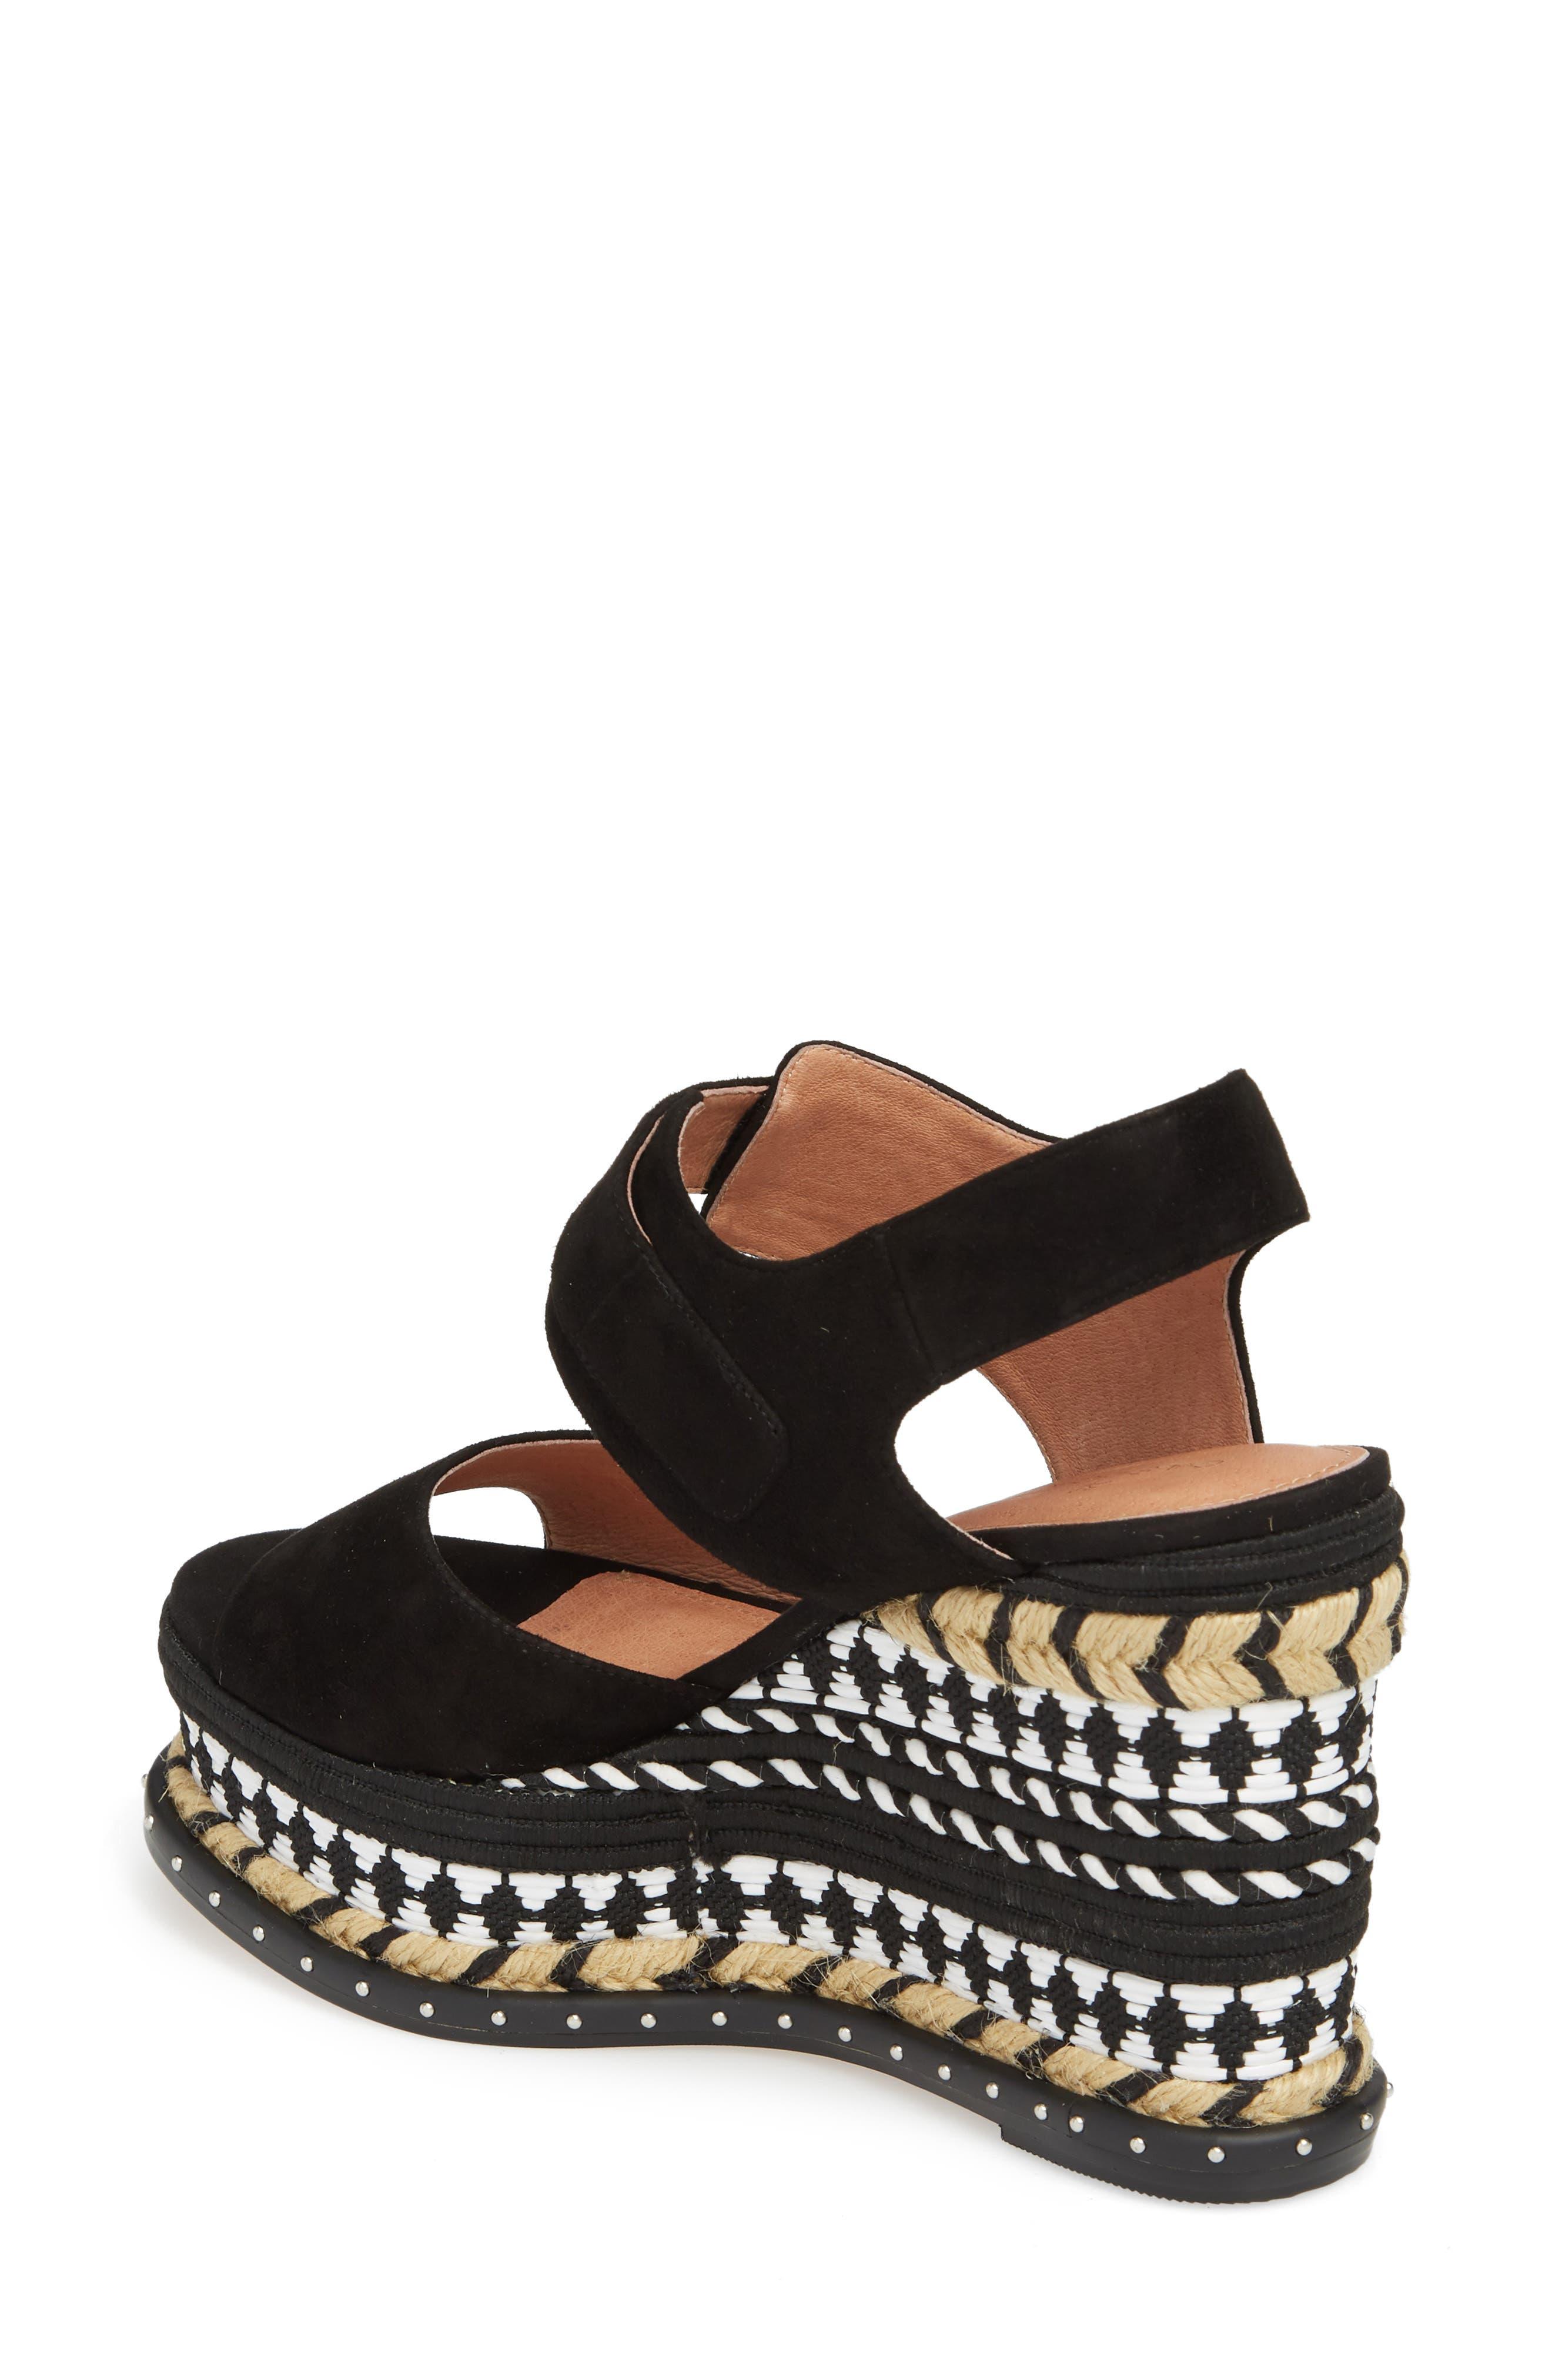 Braxton Platform Wedge Sandal,                             Alternate thumbnail 2, color,                             001